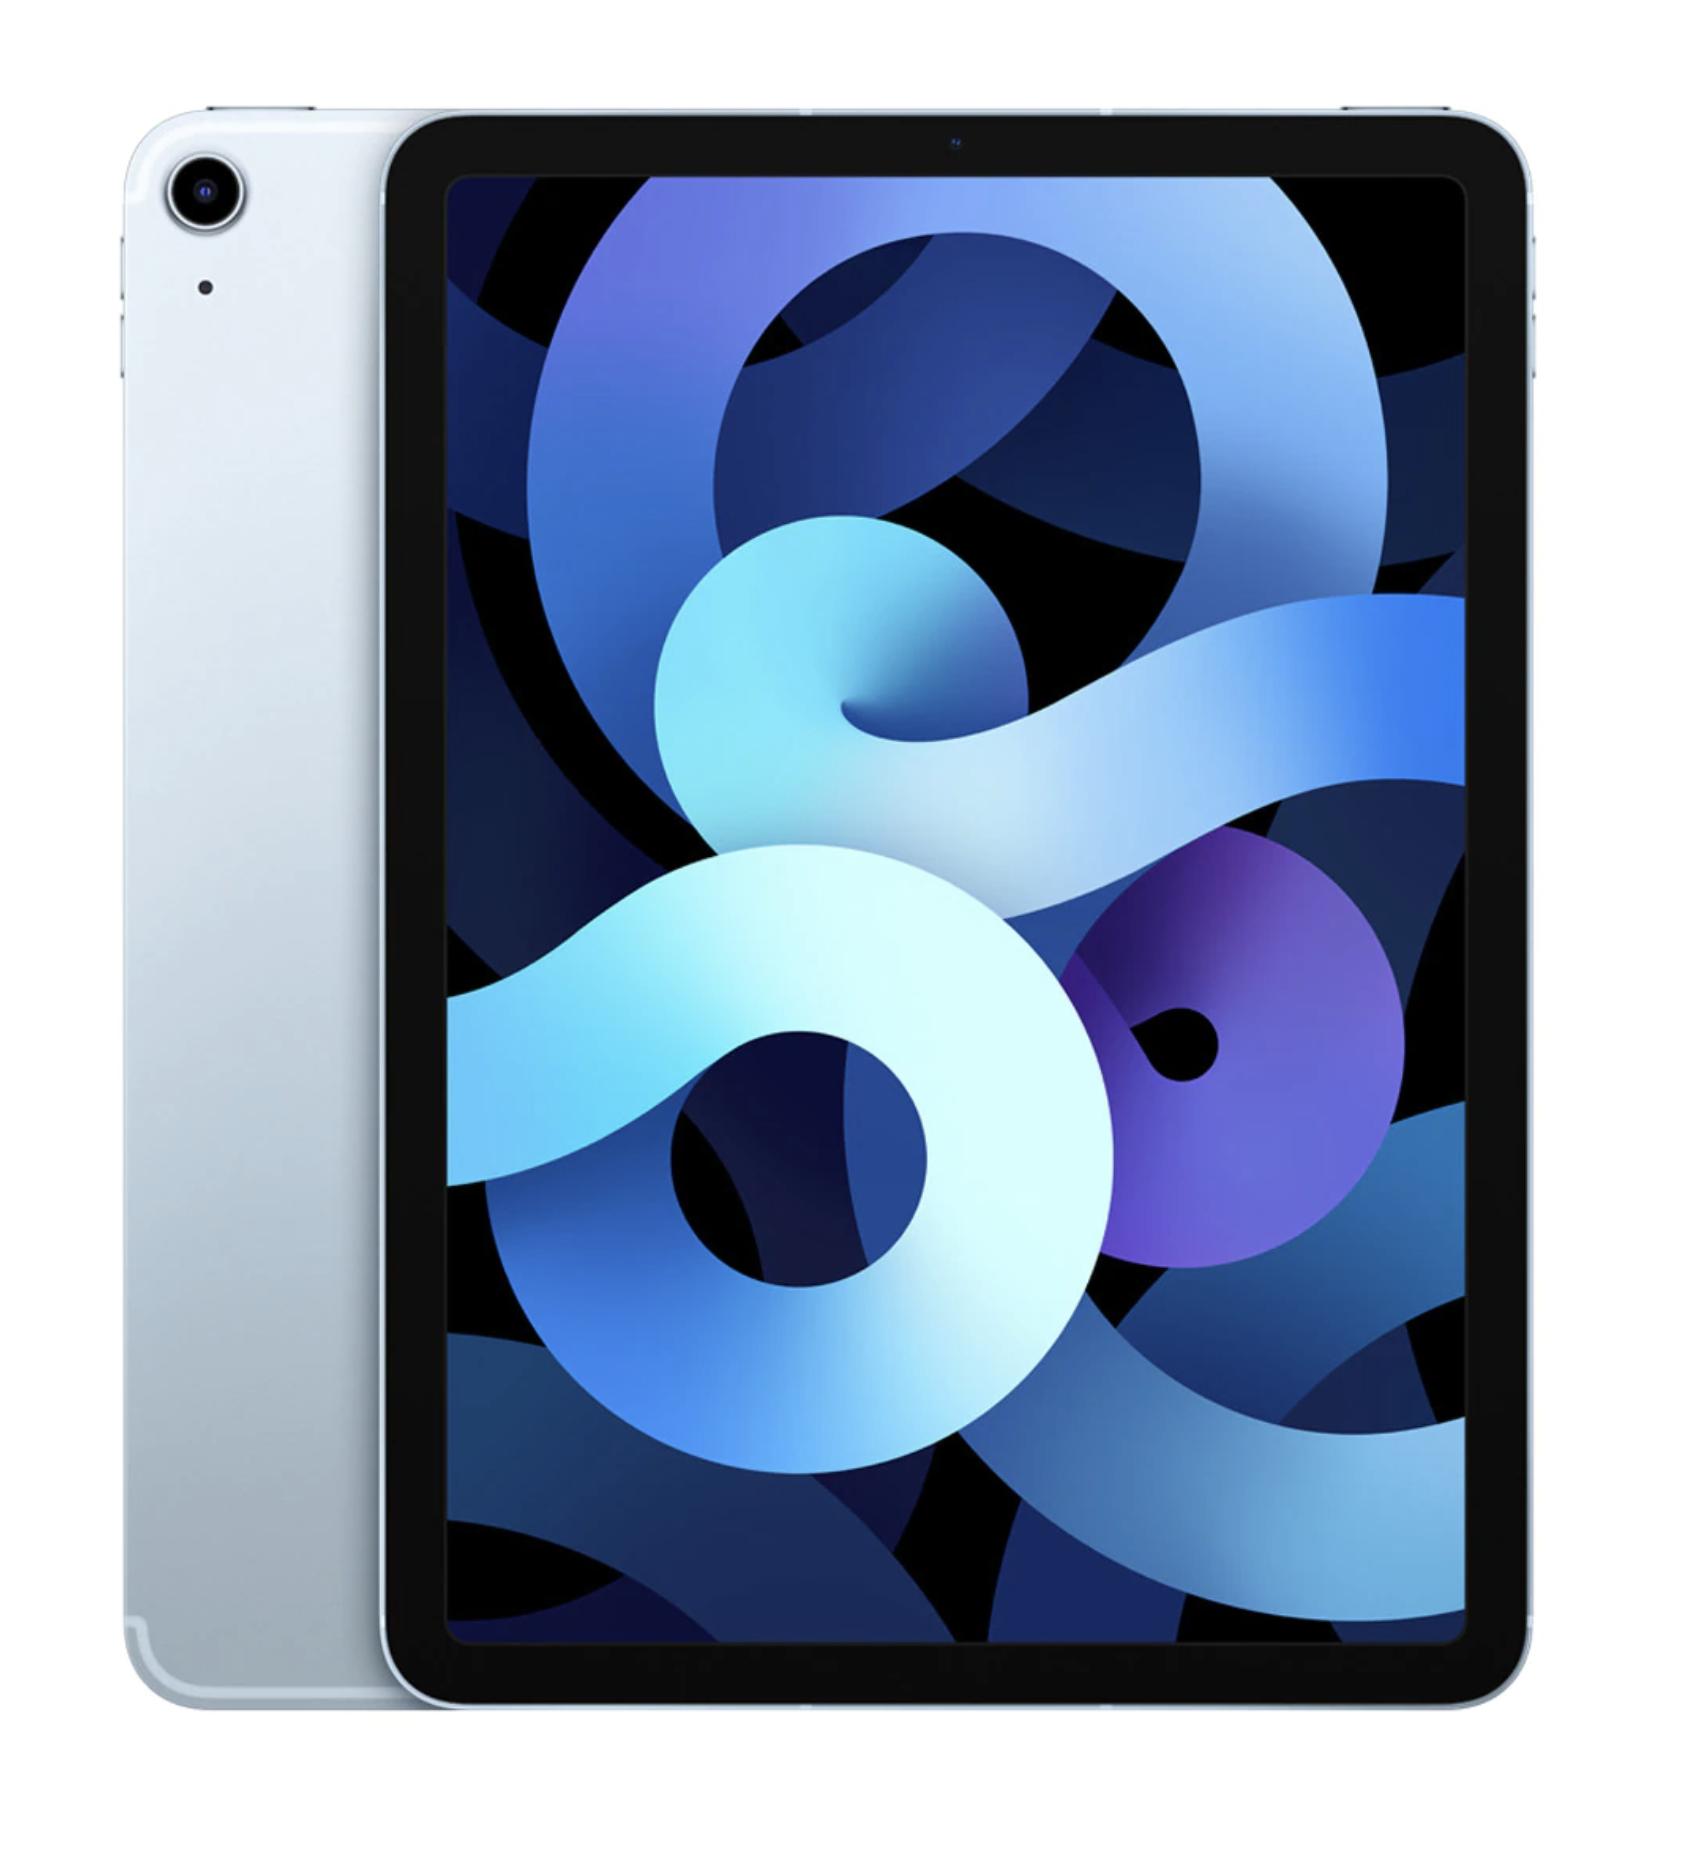 iPad Air 10.9 (2020) 64 GB Wi-Fi + Cellular Azul cielo